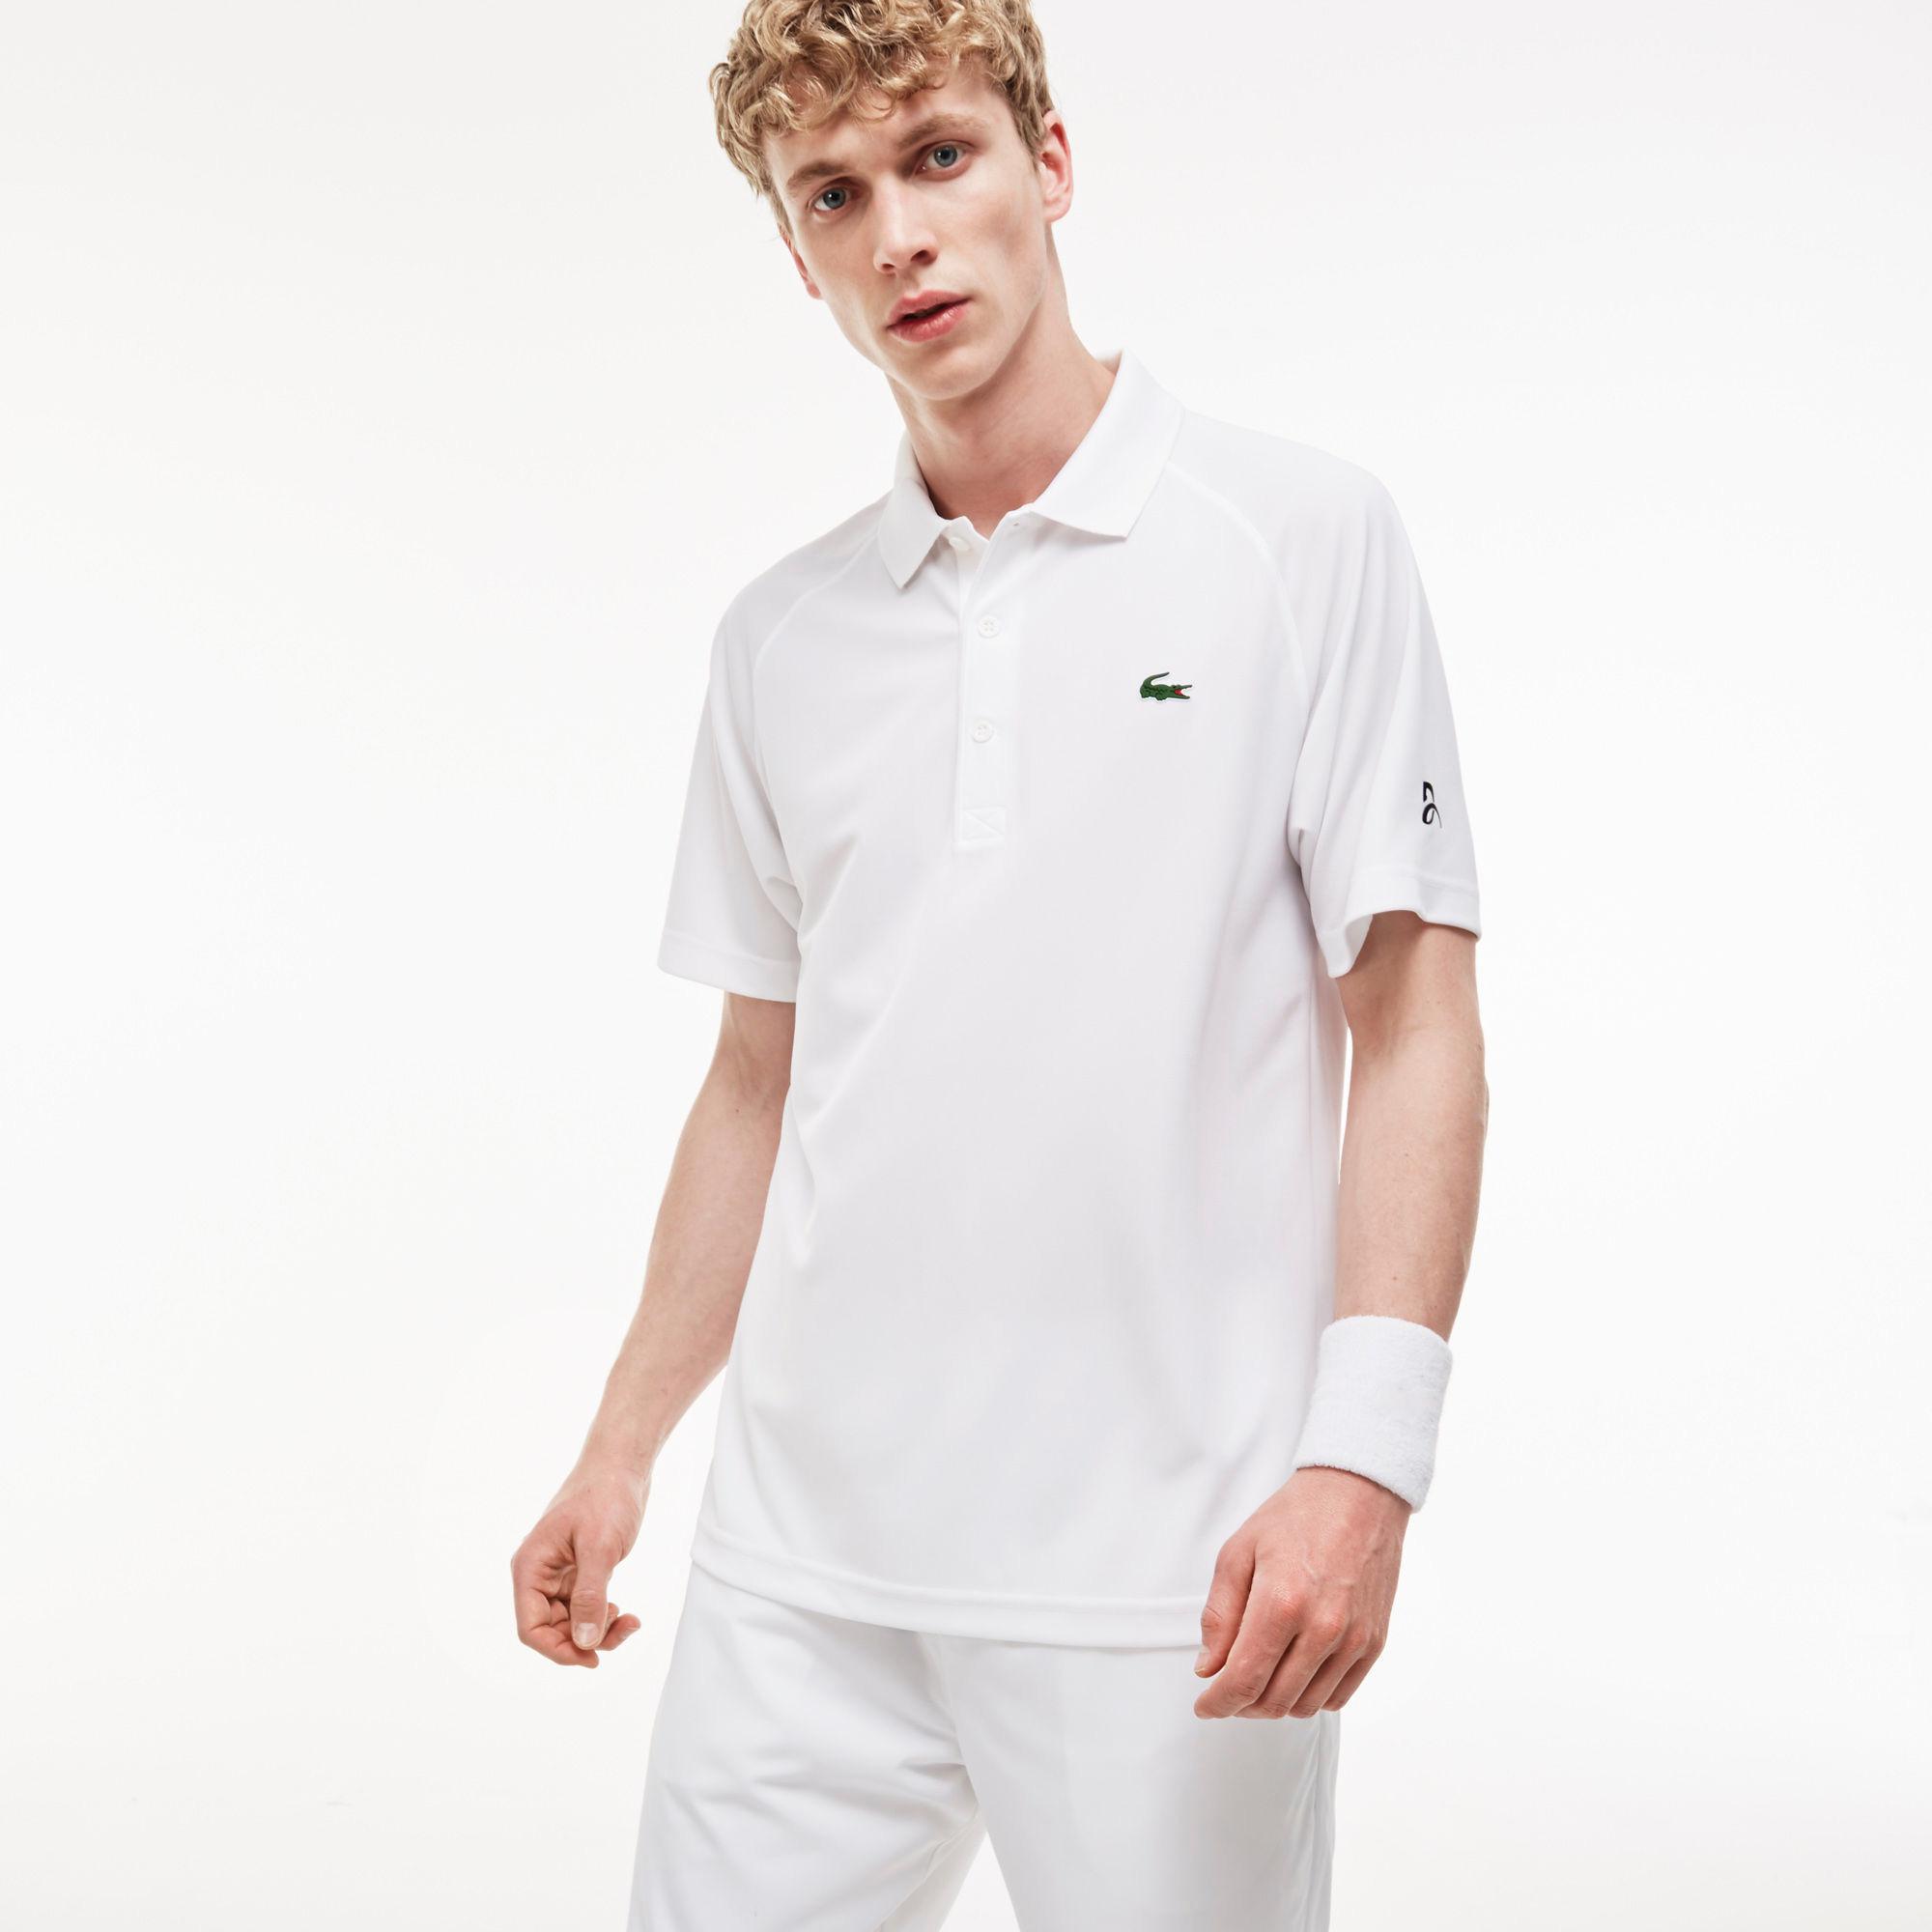 5a77d940f5e64 Lacoste Sport Mens Djokovic London Polo - White - Tennisnuts.com